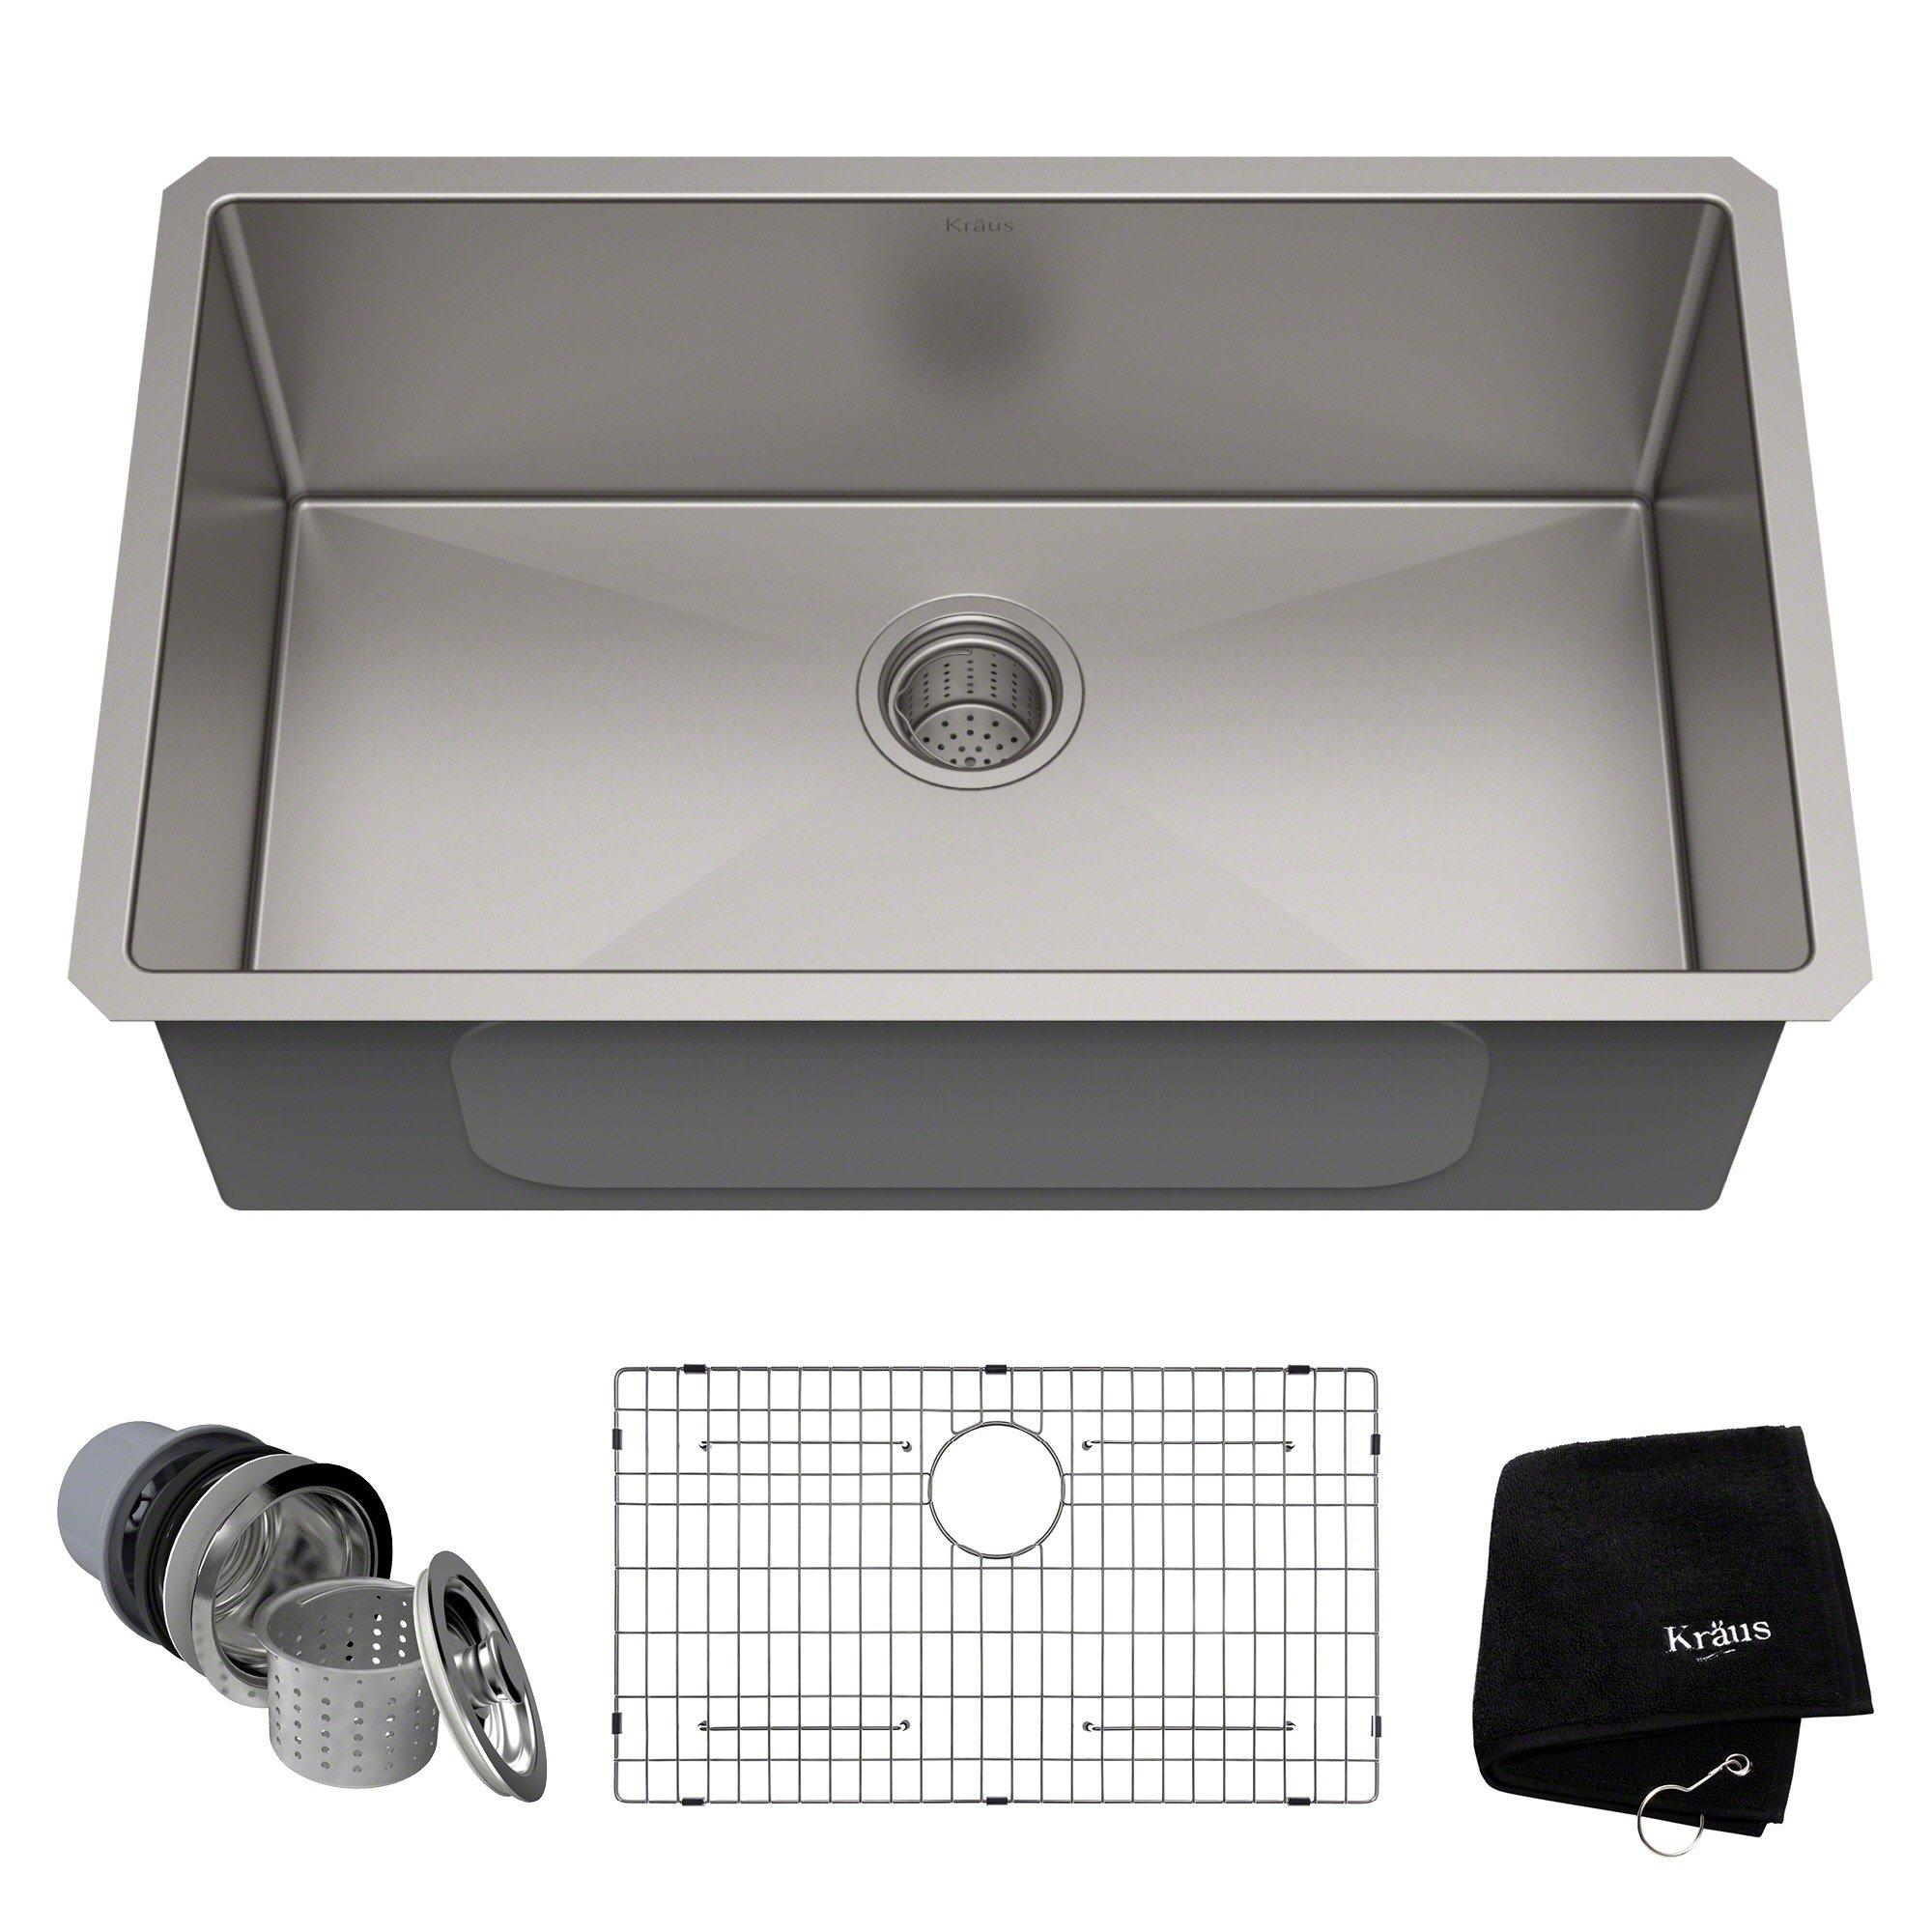 KRAUS KHU100-30 30-inch 16 Gauge Undermount Single Bowl Stainless Steel Sink by Kraus